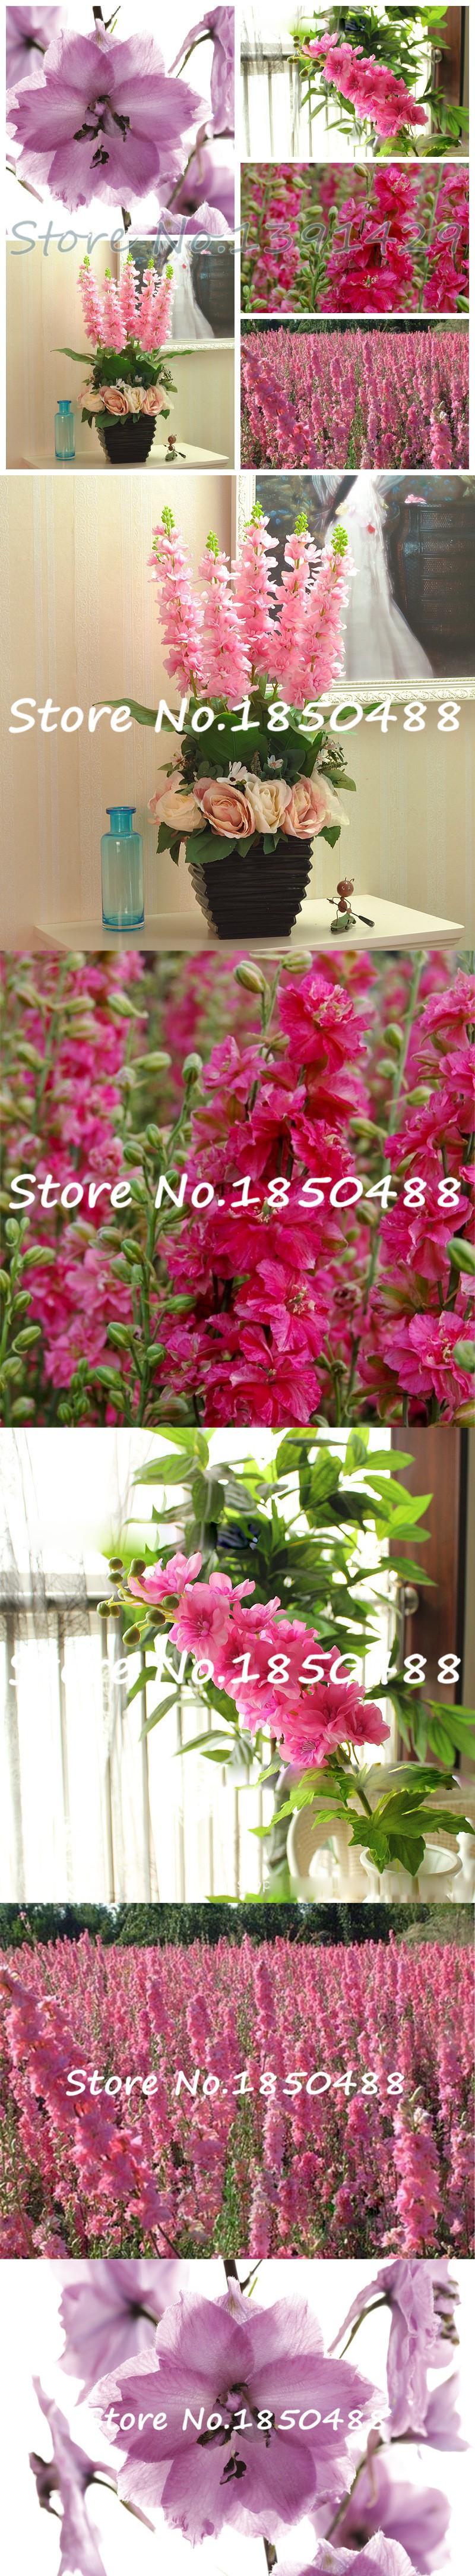 50 pcs/ bag rocket consolida, pink larkspur, delphinium pink flower ...